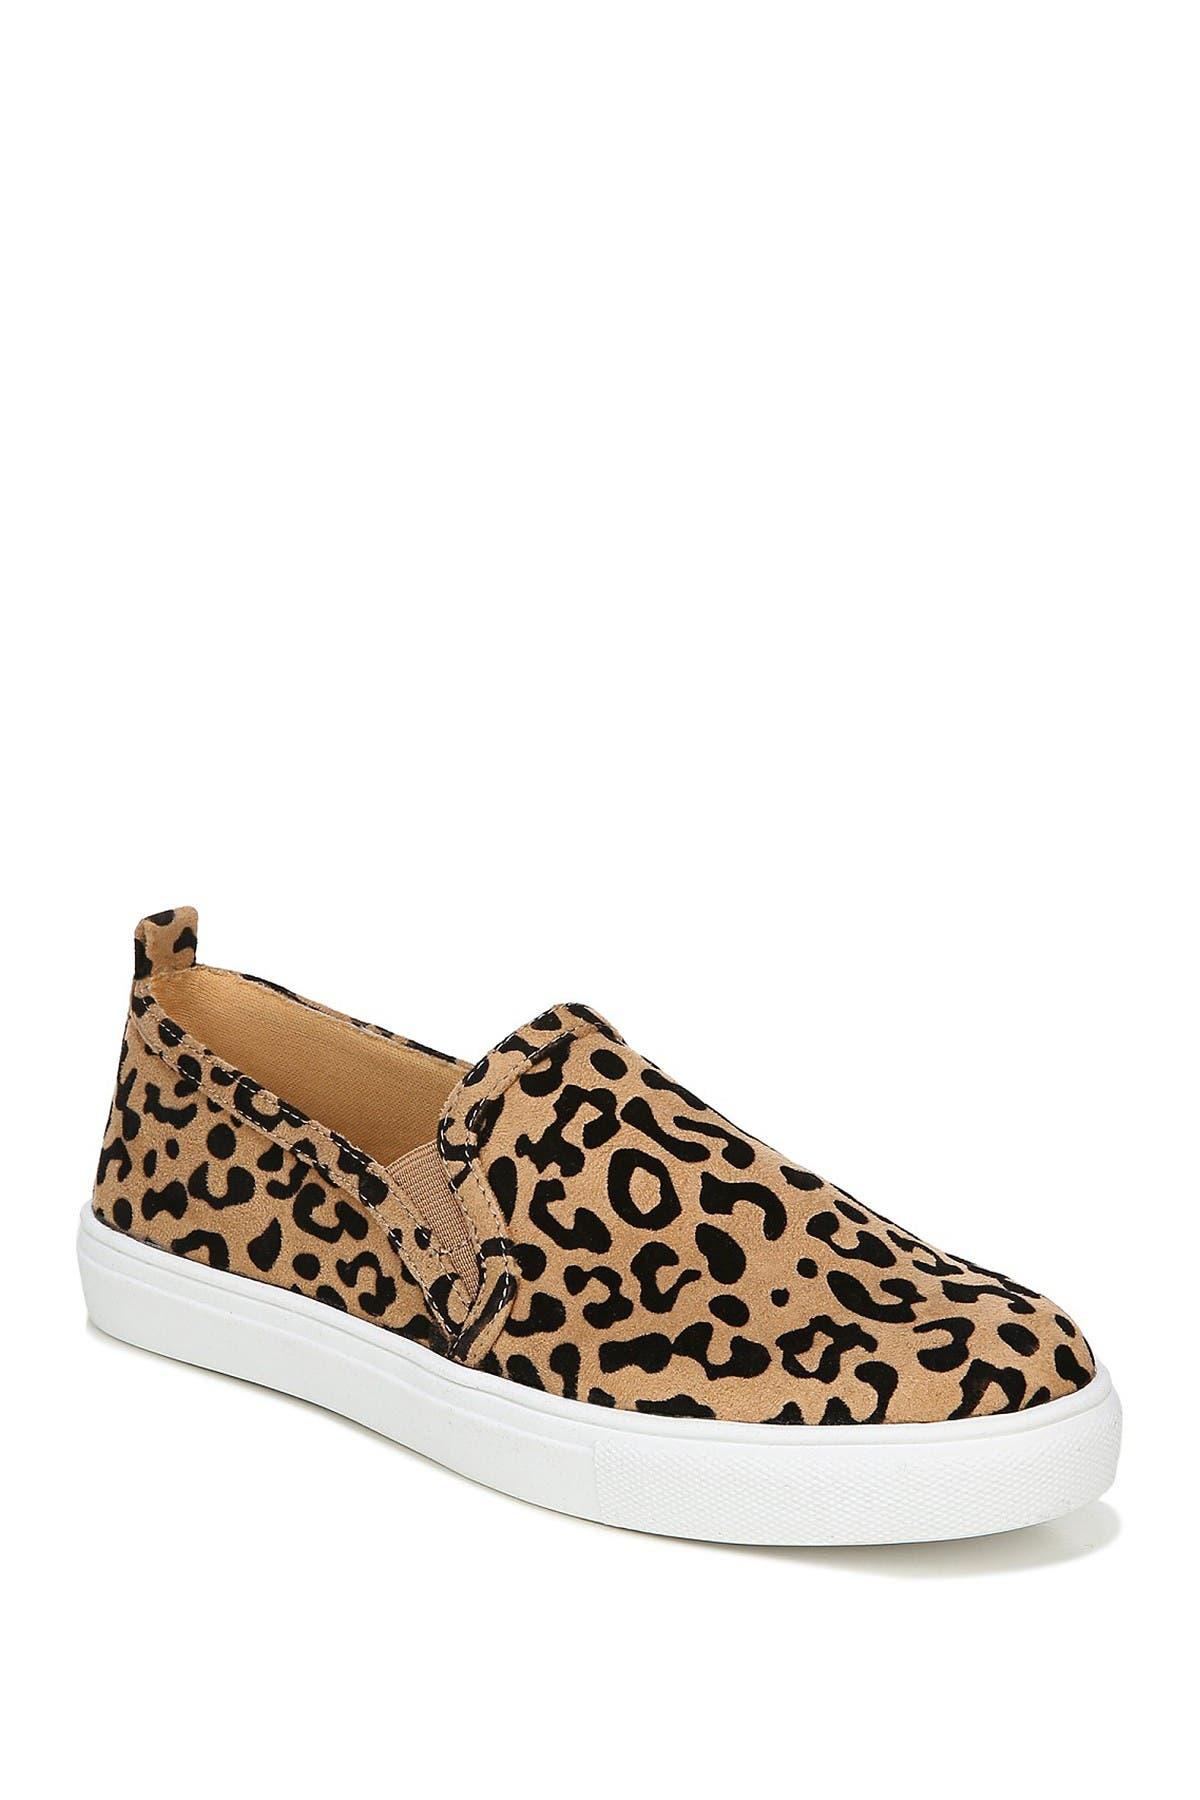 Shortly Cheetah Print Slip-On Sneaker